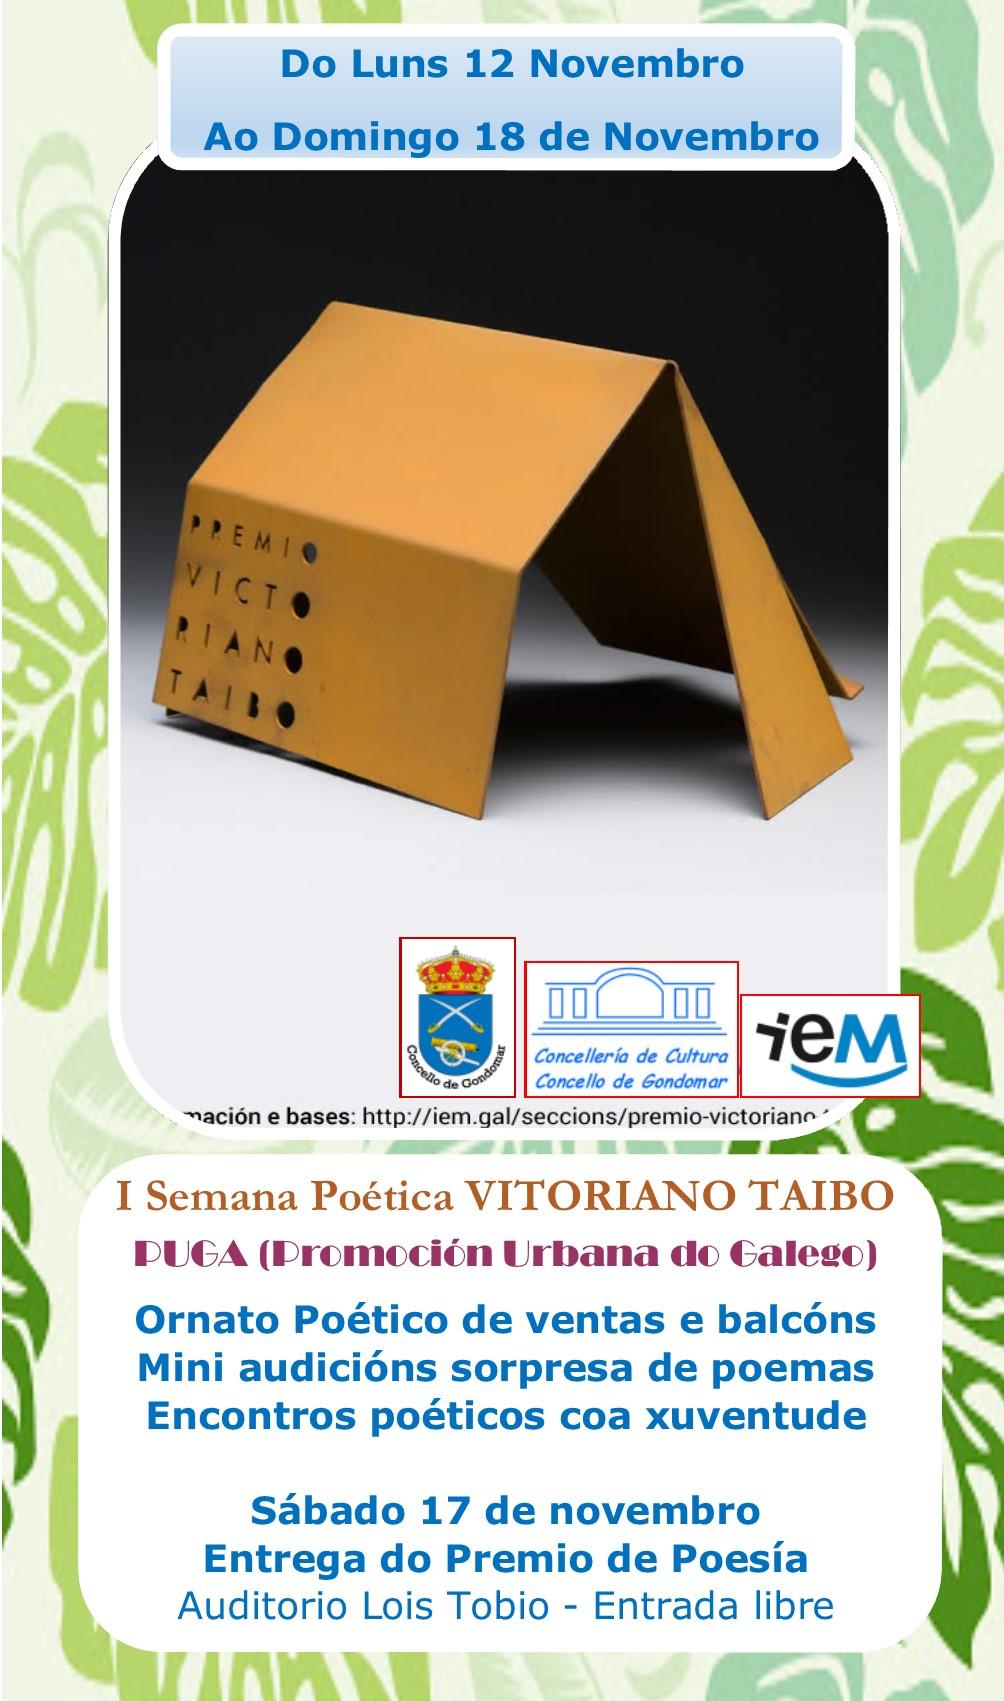 I Semana Poética Vitoriano Taibo @ Galicia | España